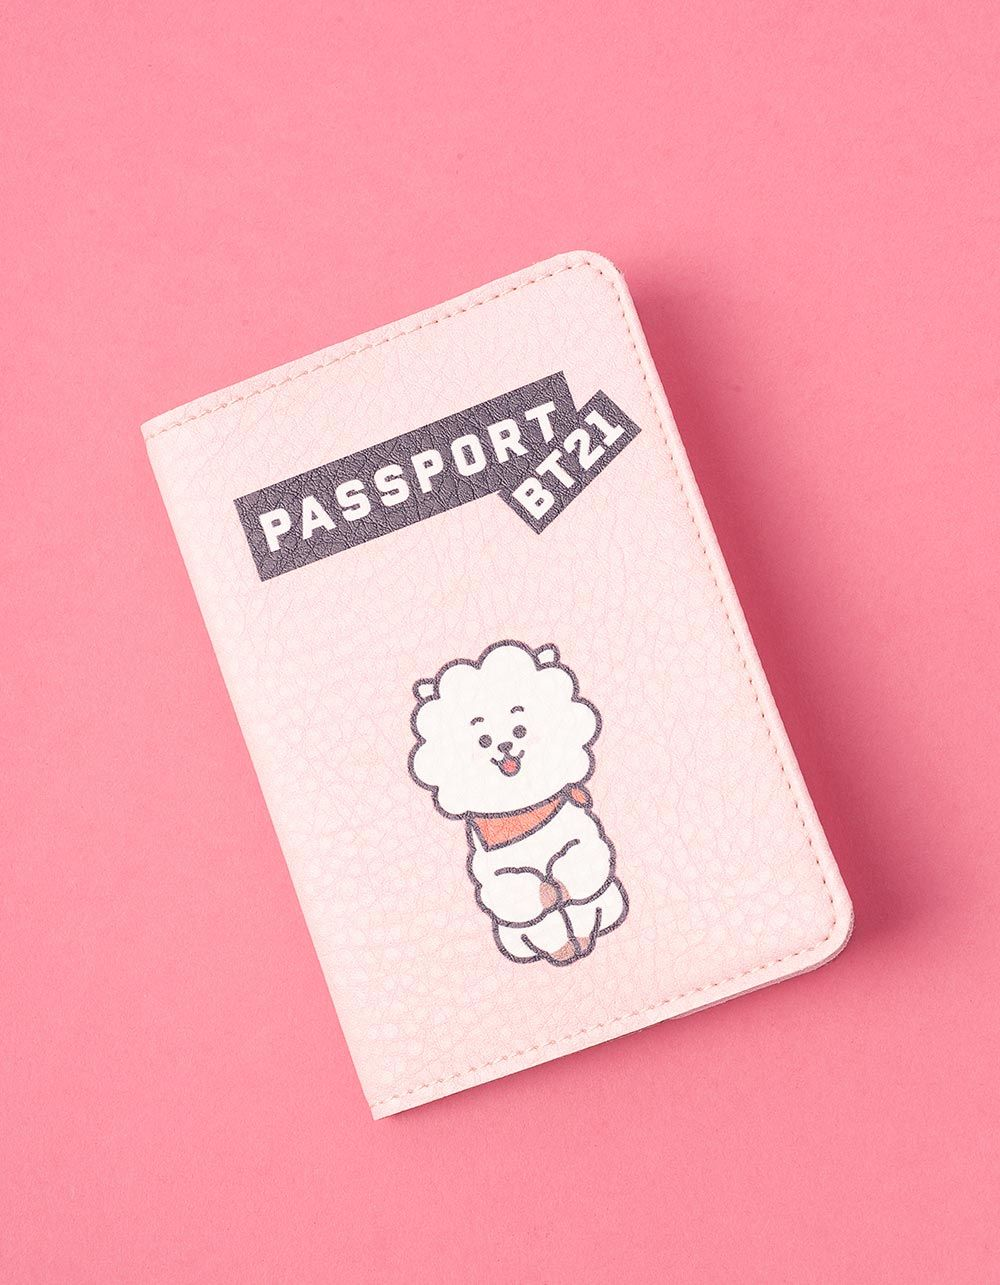 Обкладинка на паспорт з принтом RJ  Джин bts bt21   237246-14-XX